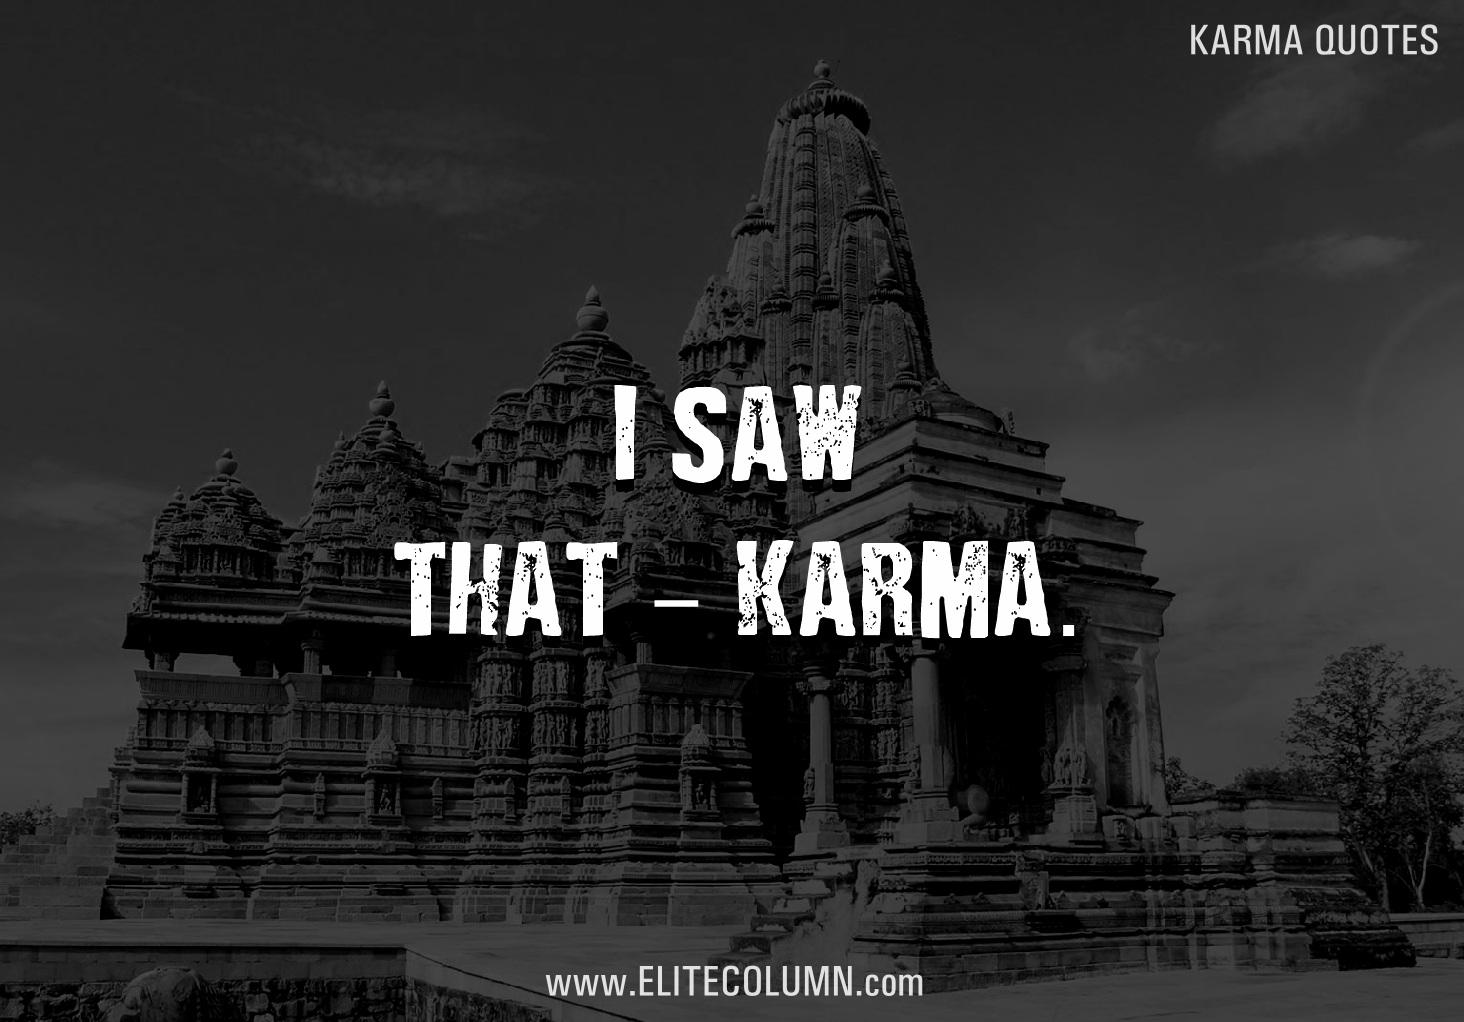 Karma Quotes (7)